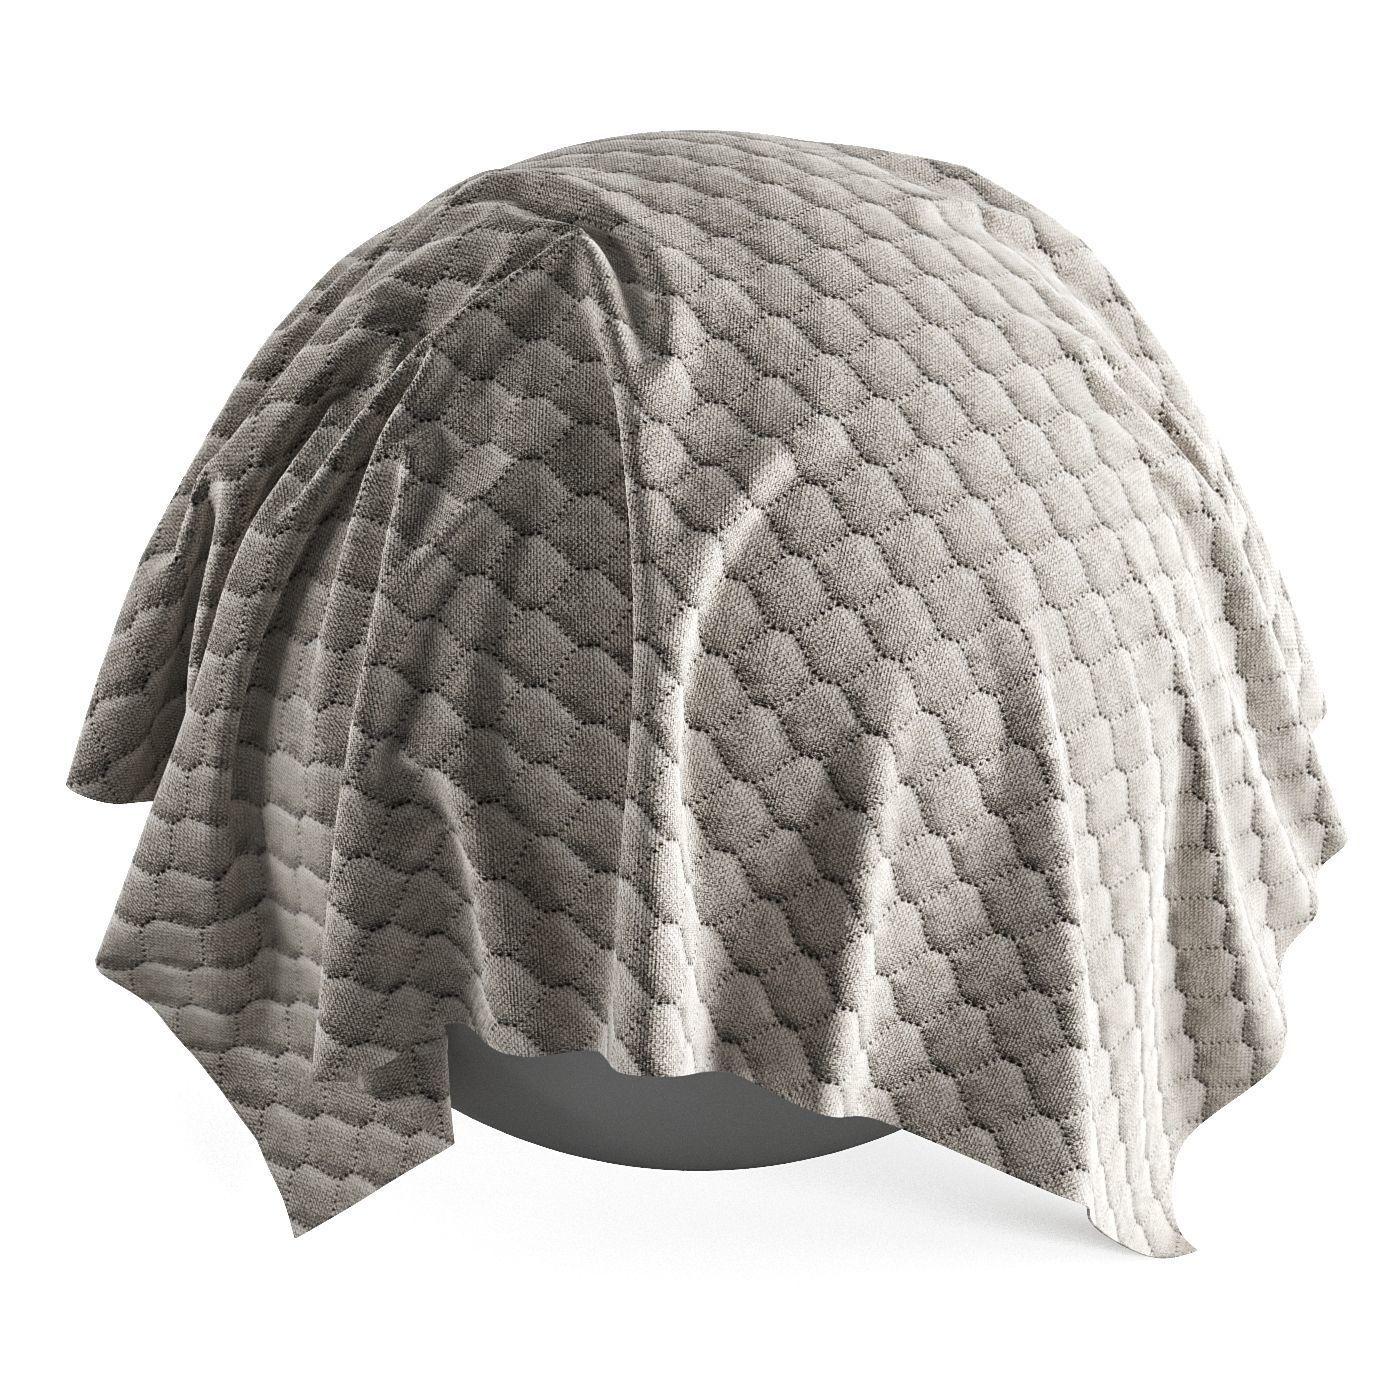 Fabric material 01